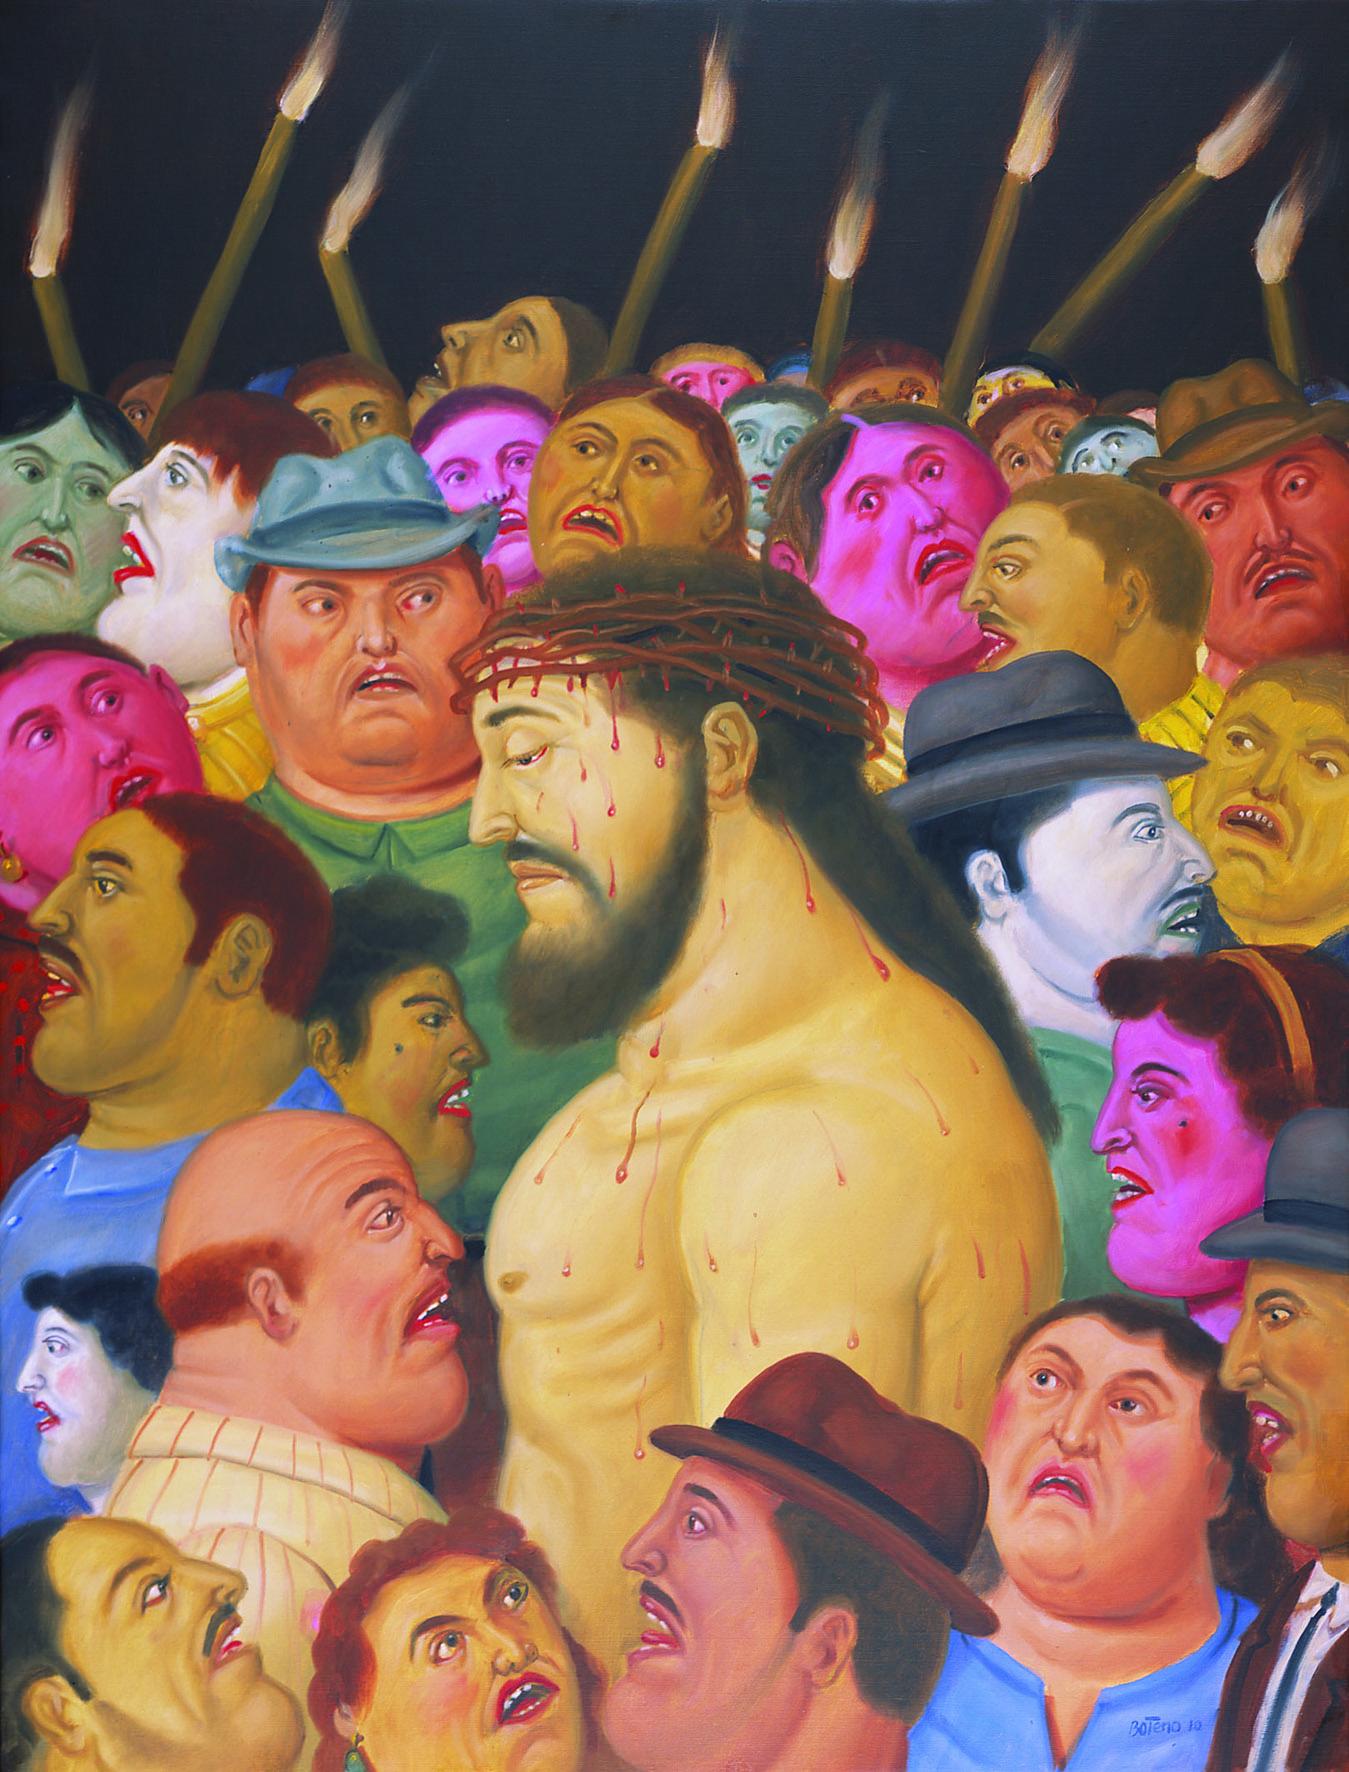 Jesús y la multitud, 2010 Cristo e la moltitudine Jesus and the Crowd Olio su tela / Oil on canvas 106 x 81 cm Medellín, Museo de Antioquia